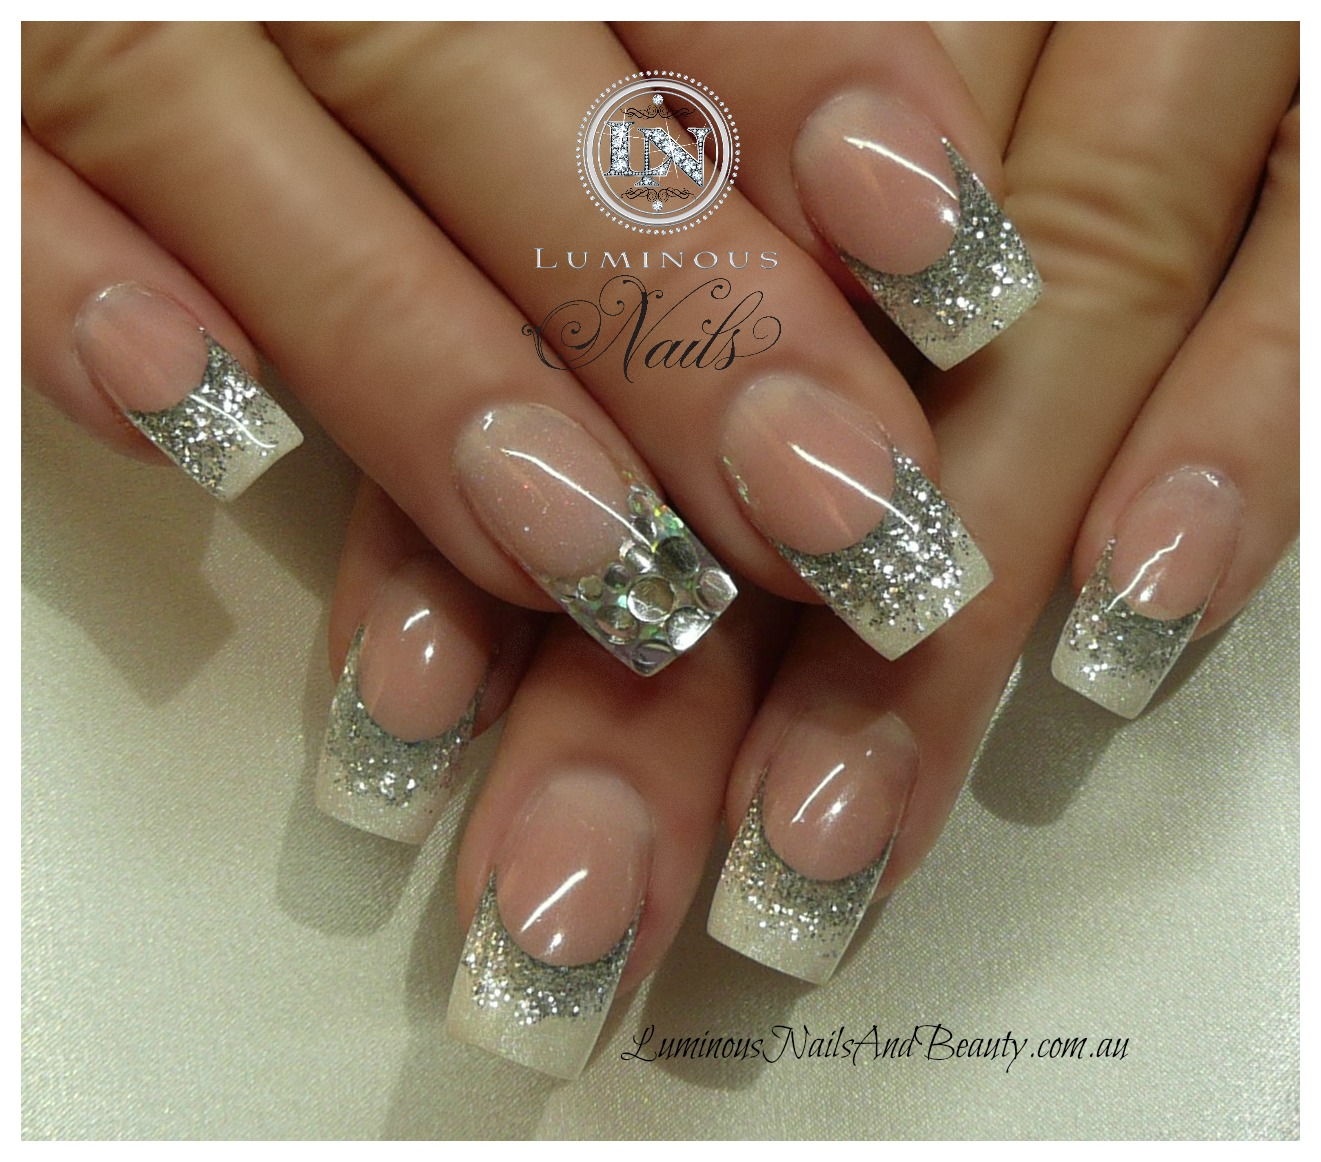 Glitter Acrylic Nail Designs   ... nails,+Sculptured+Acrylic+nails+ ...